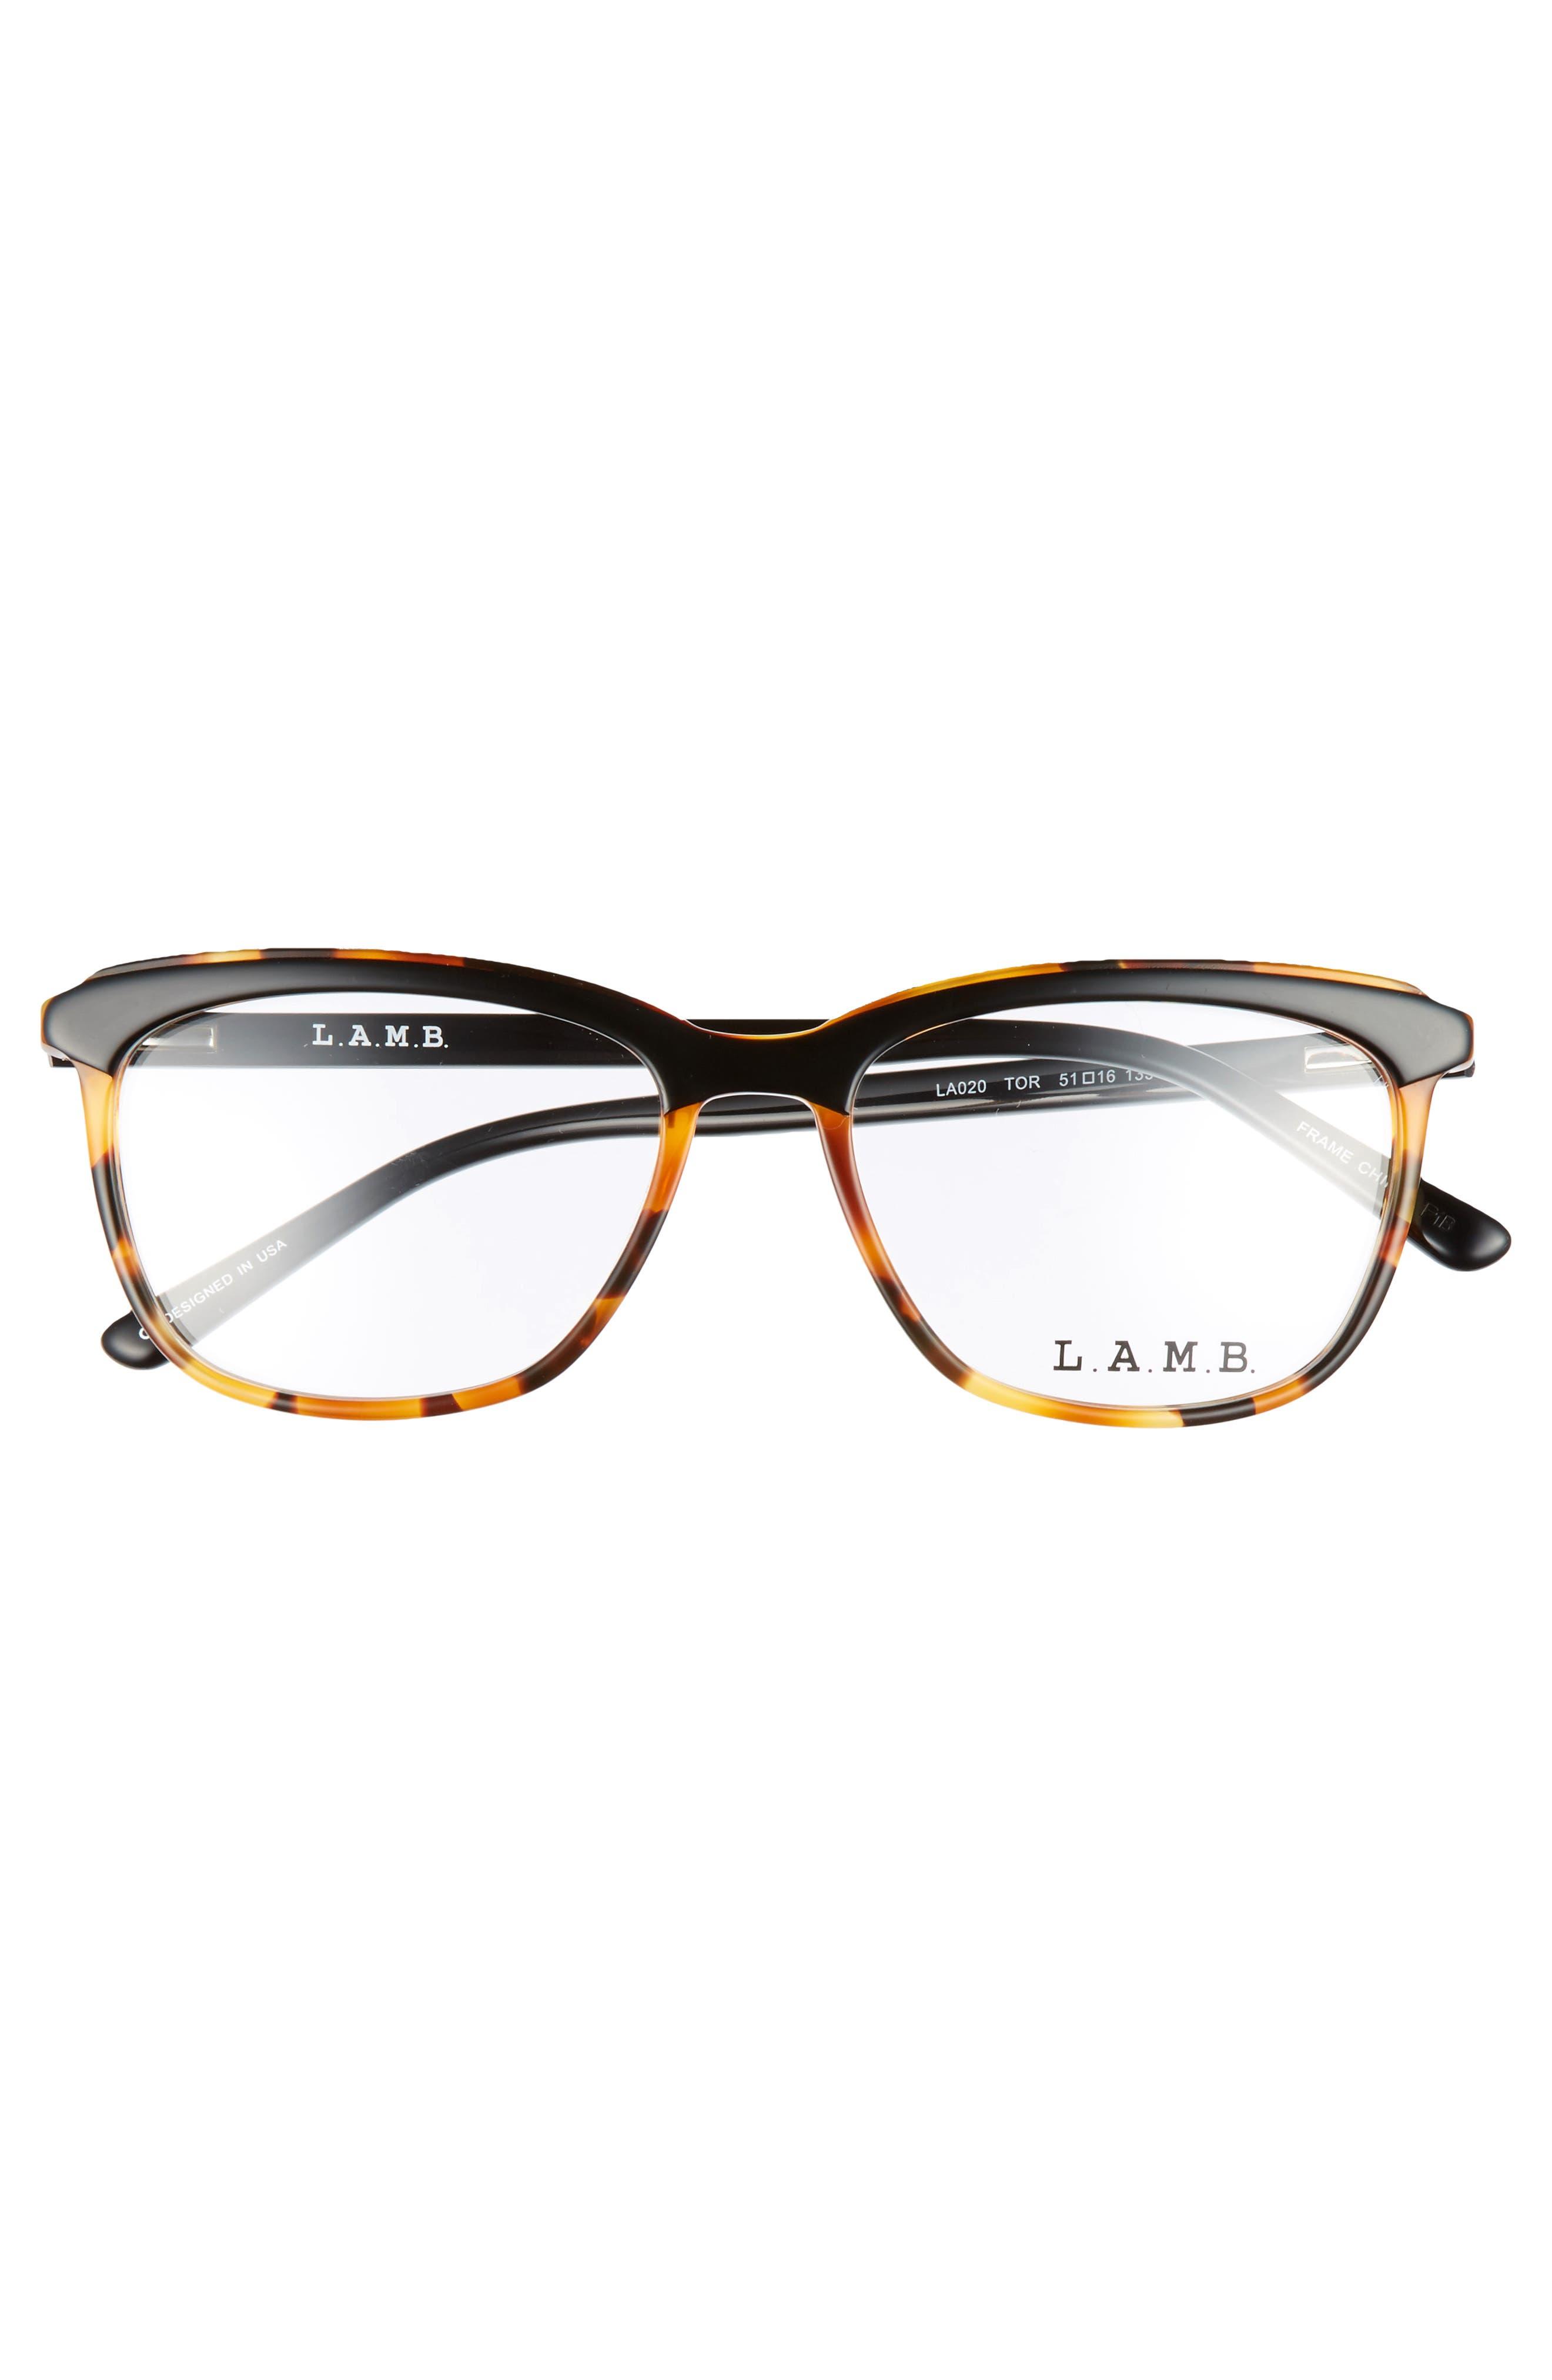 51mm Optical Square Glasses,                             Alternate thumbnail 3, color,                             001